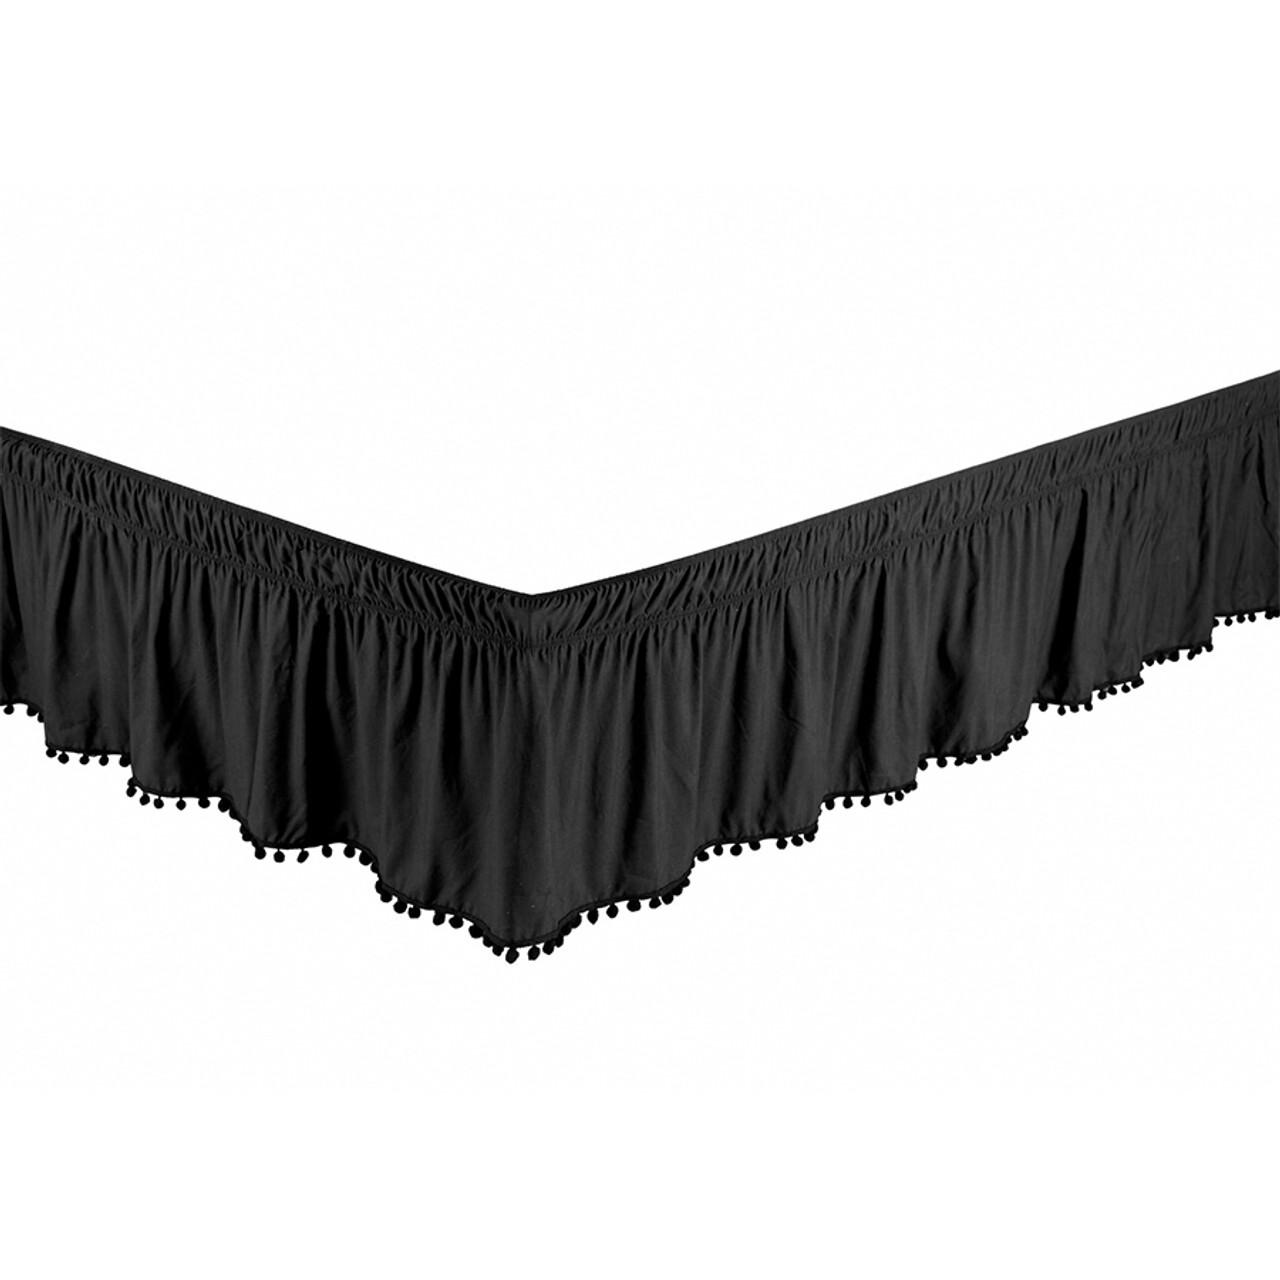 "Black Bed Skirt Dust Ruffle with Pom-Pom Fringe 100% Brushed Microfiber with 14"" Drop in USA, California, New York, New York City, Los Angeles, San Francisco, Pennsylvania, Washington DC, Virginia, Maryland"